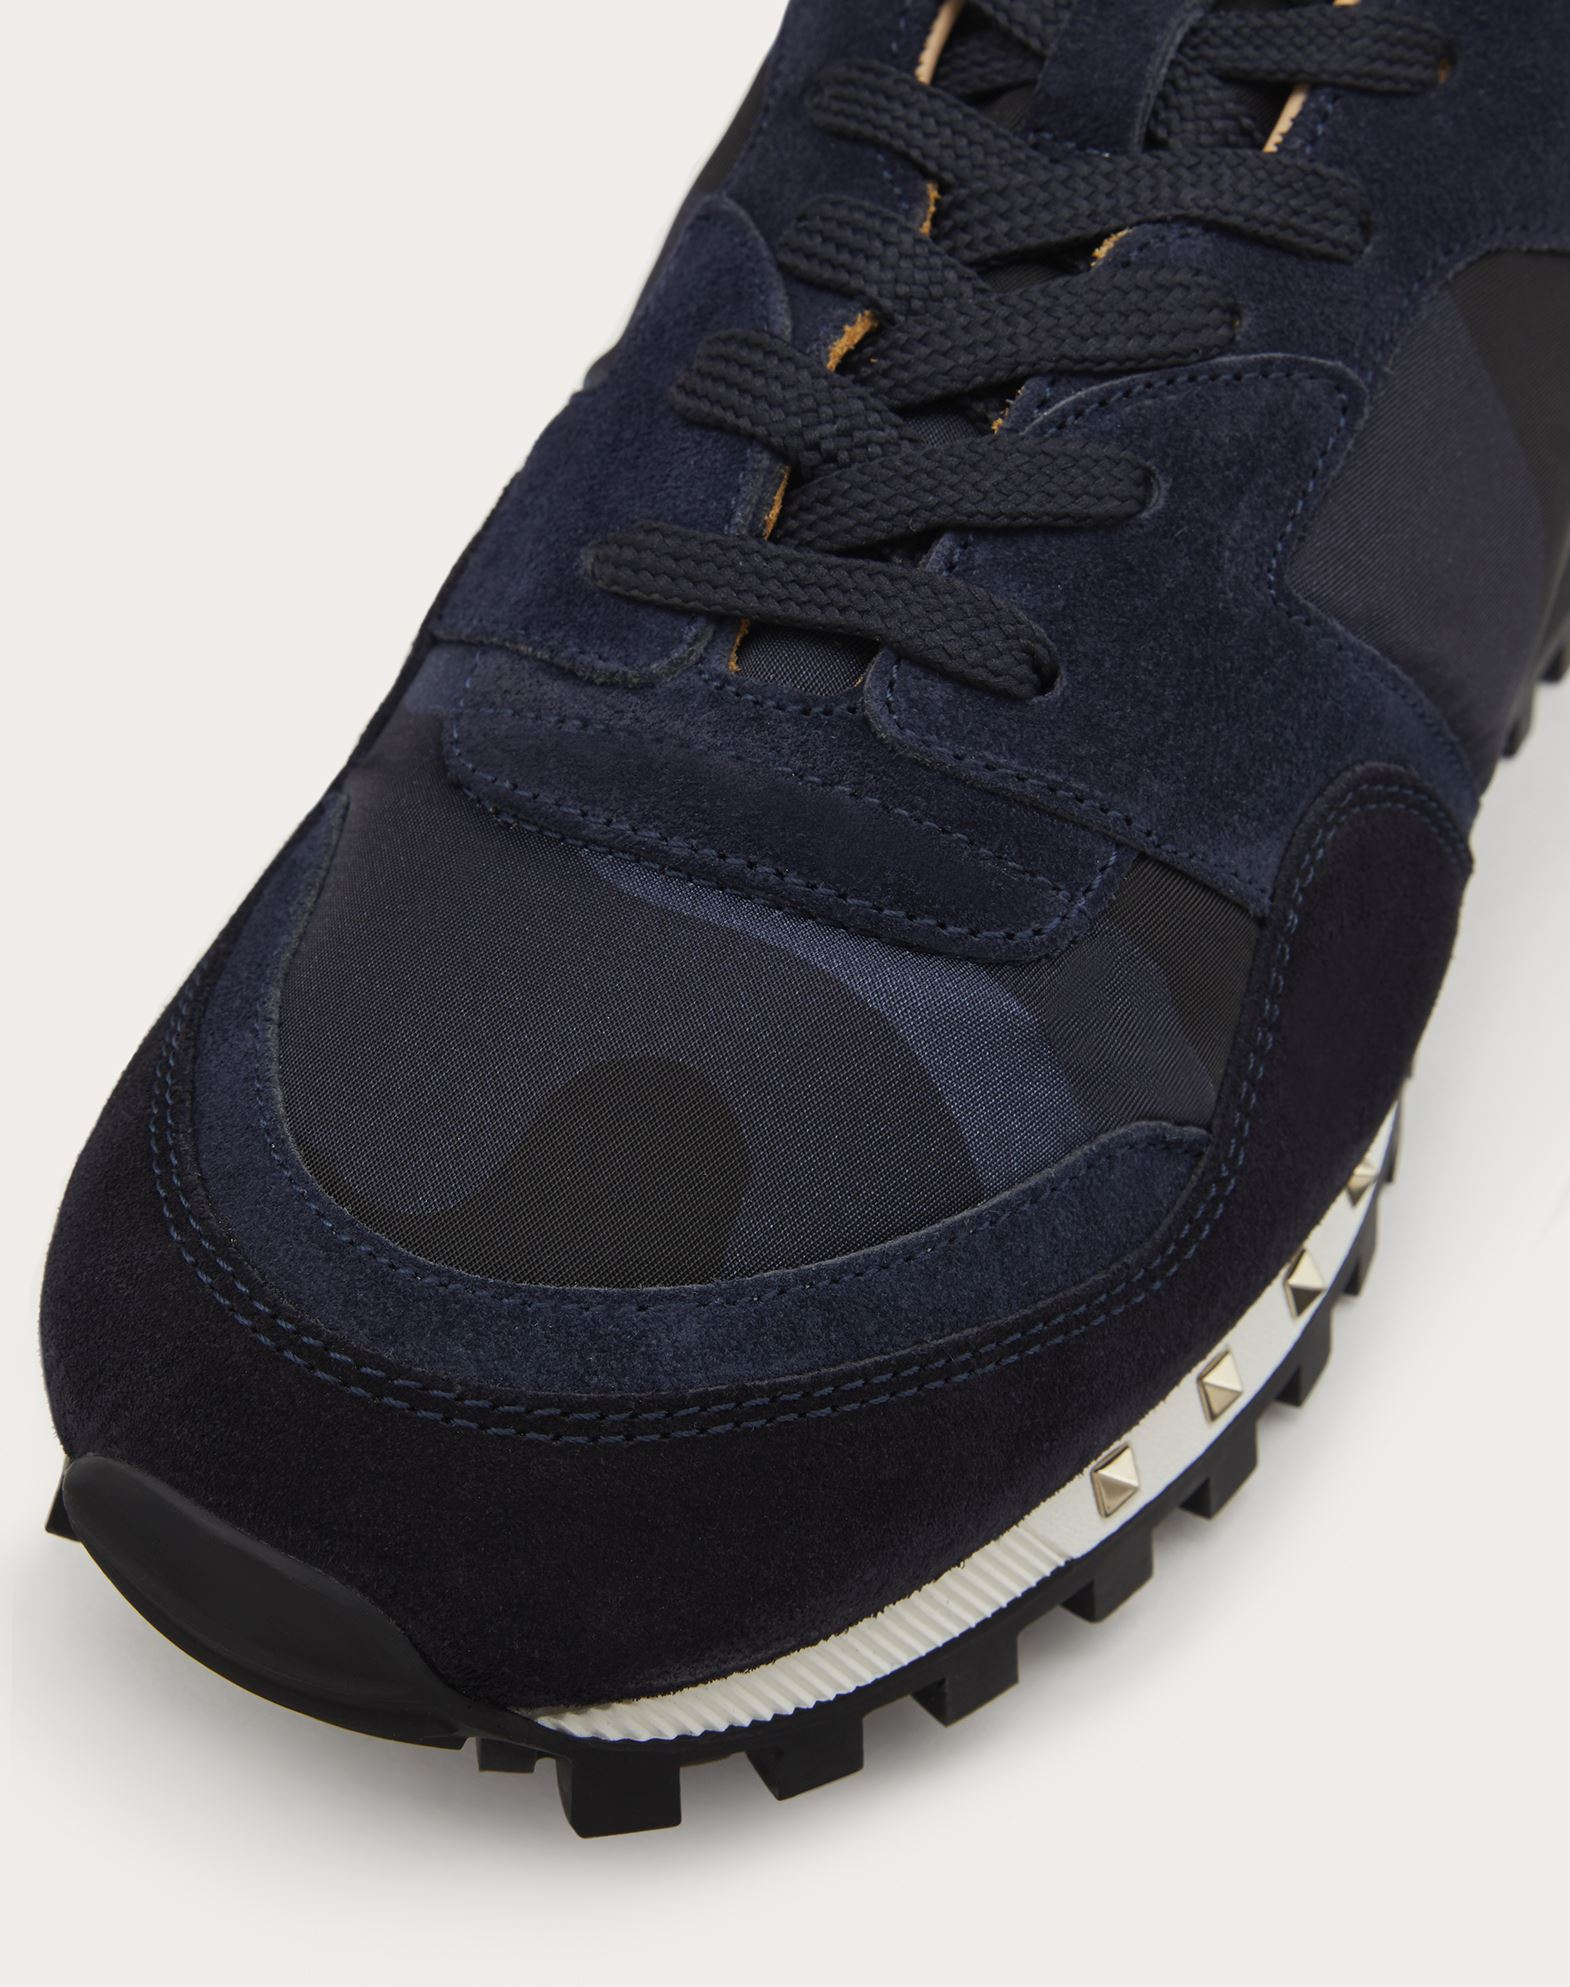 VALENTINO GARAVANI UOMO Sneaker Camuflaje LOW-TOP SNEAKERS U a